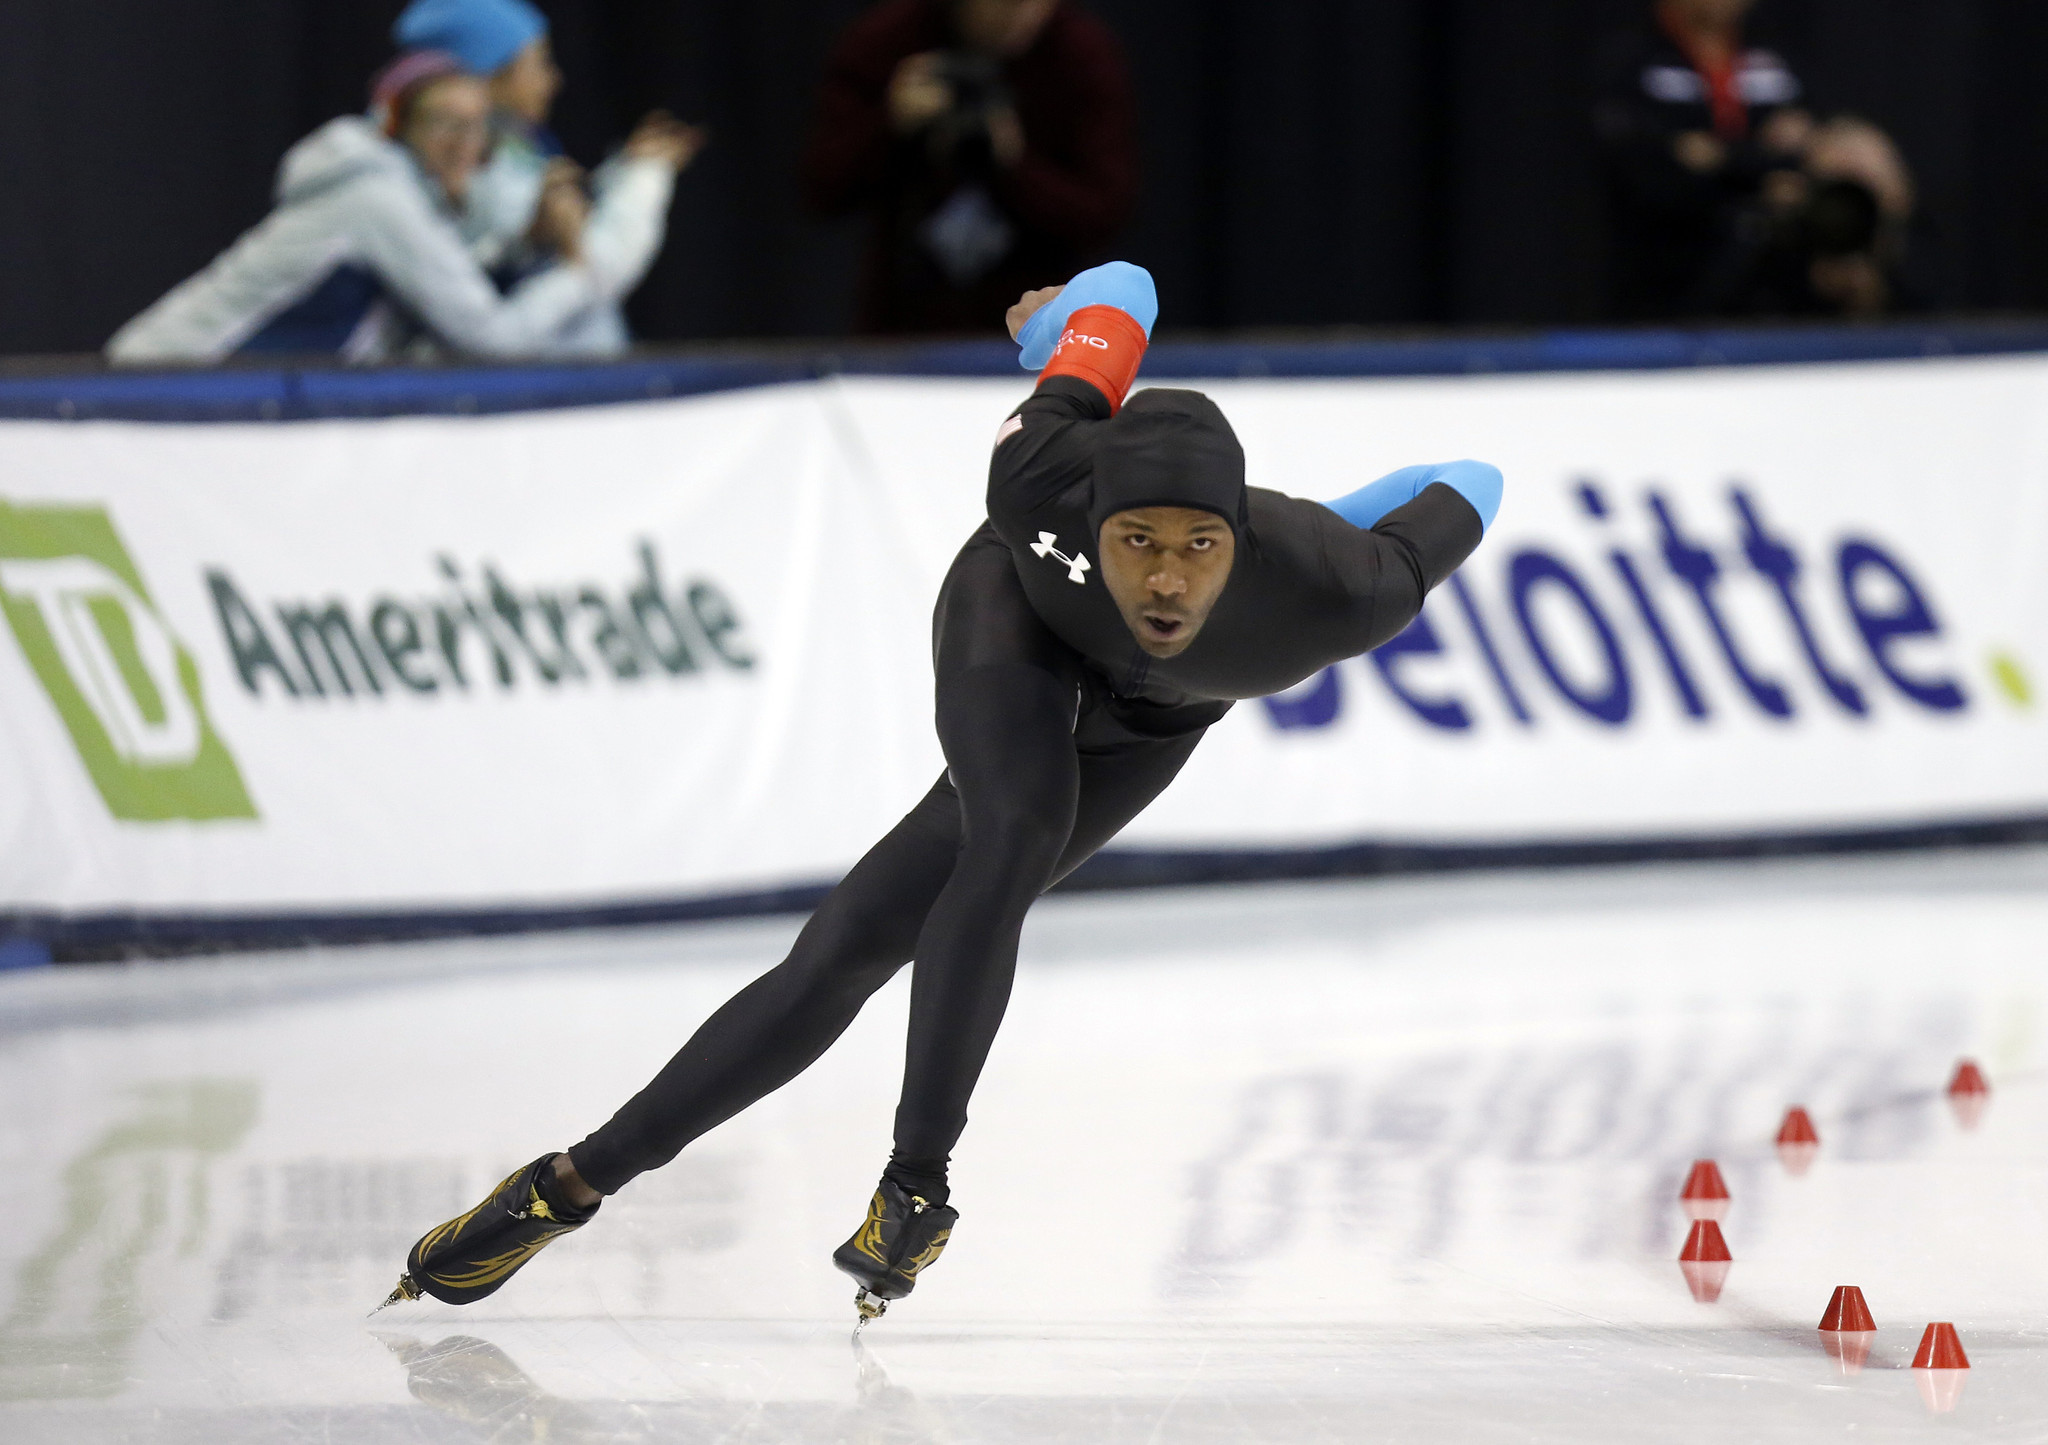 Will new suit will revolutionize speedskating? - Hoy